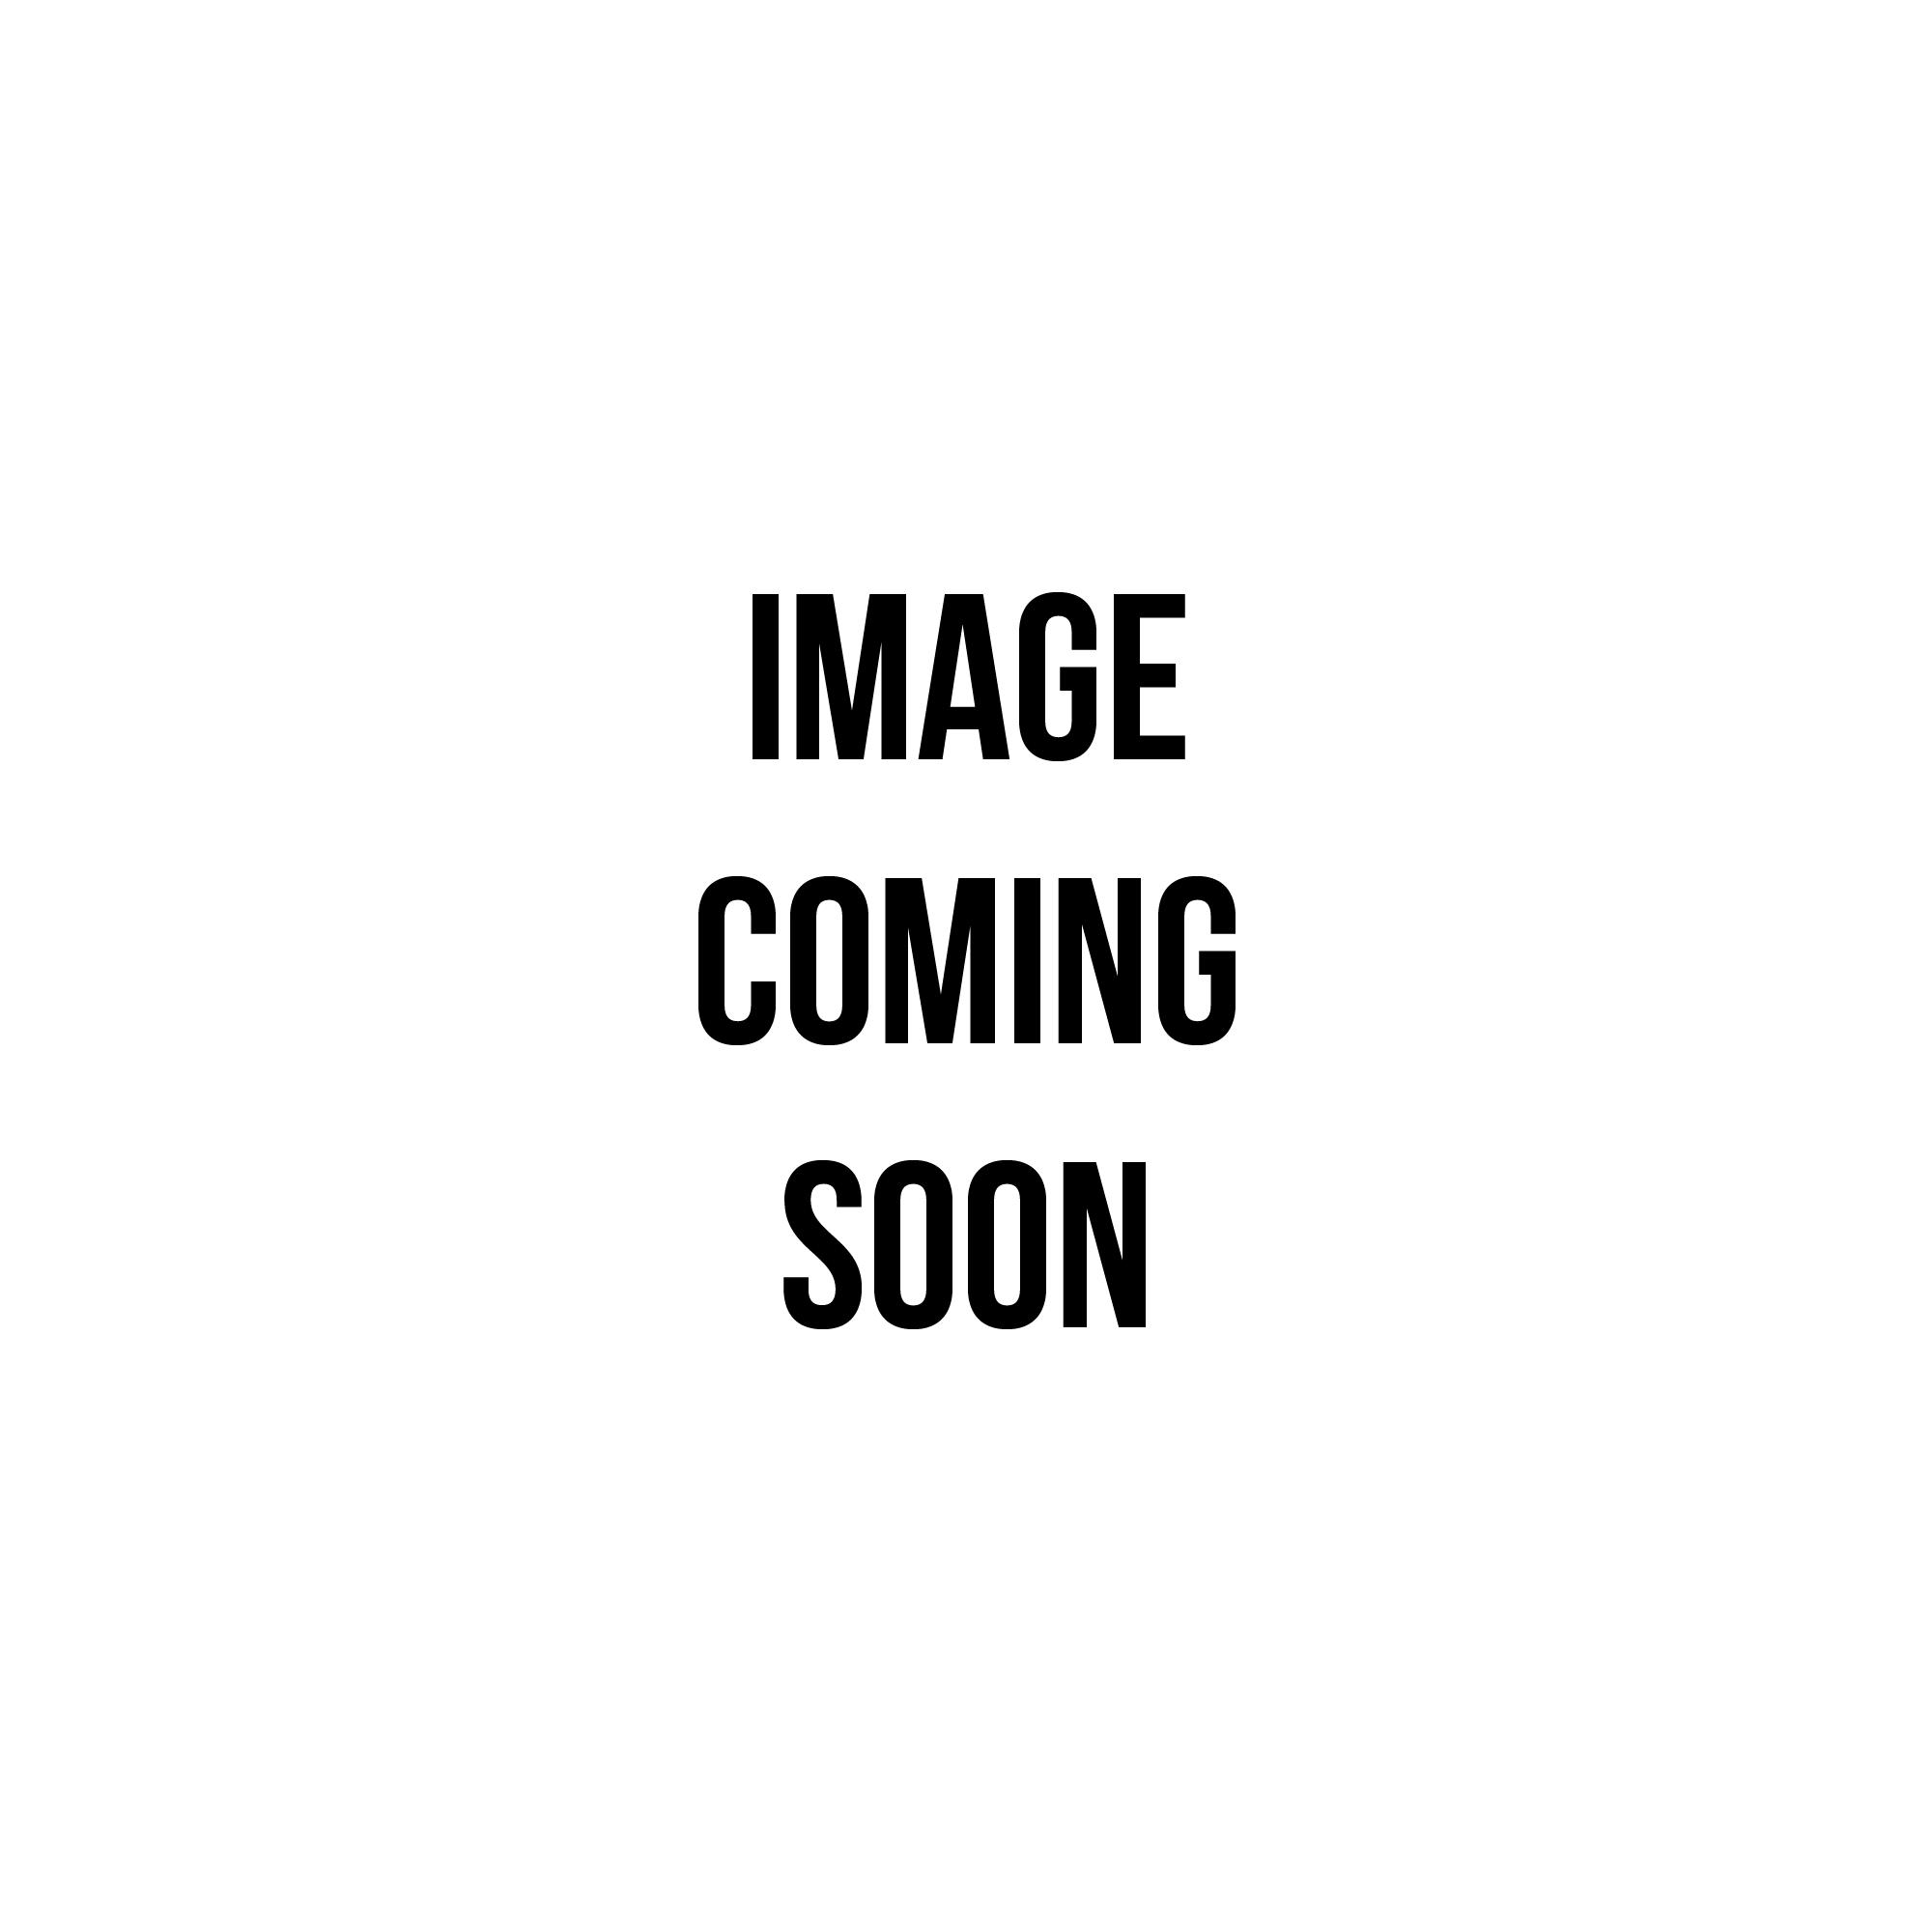 Air Max 95 360 Noir / Anthracite / Blanc / Sport Rediffmail Livraison gratuite profiter 2cVExV